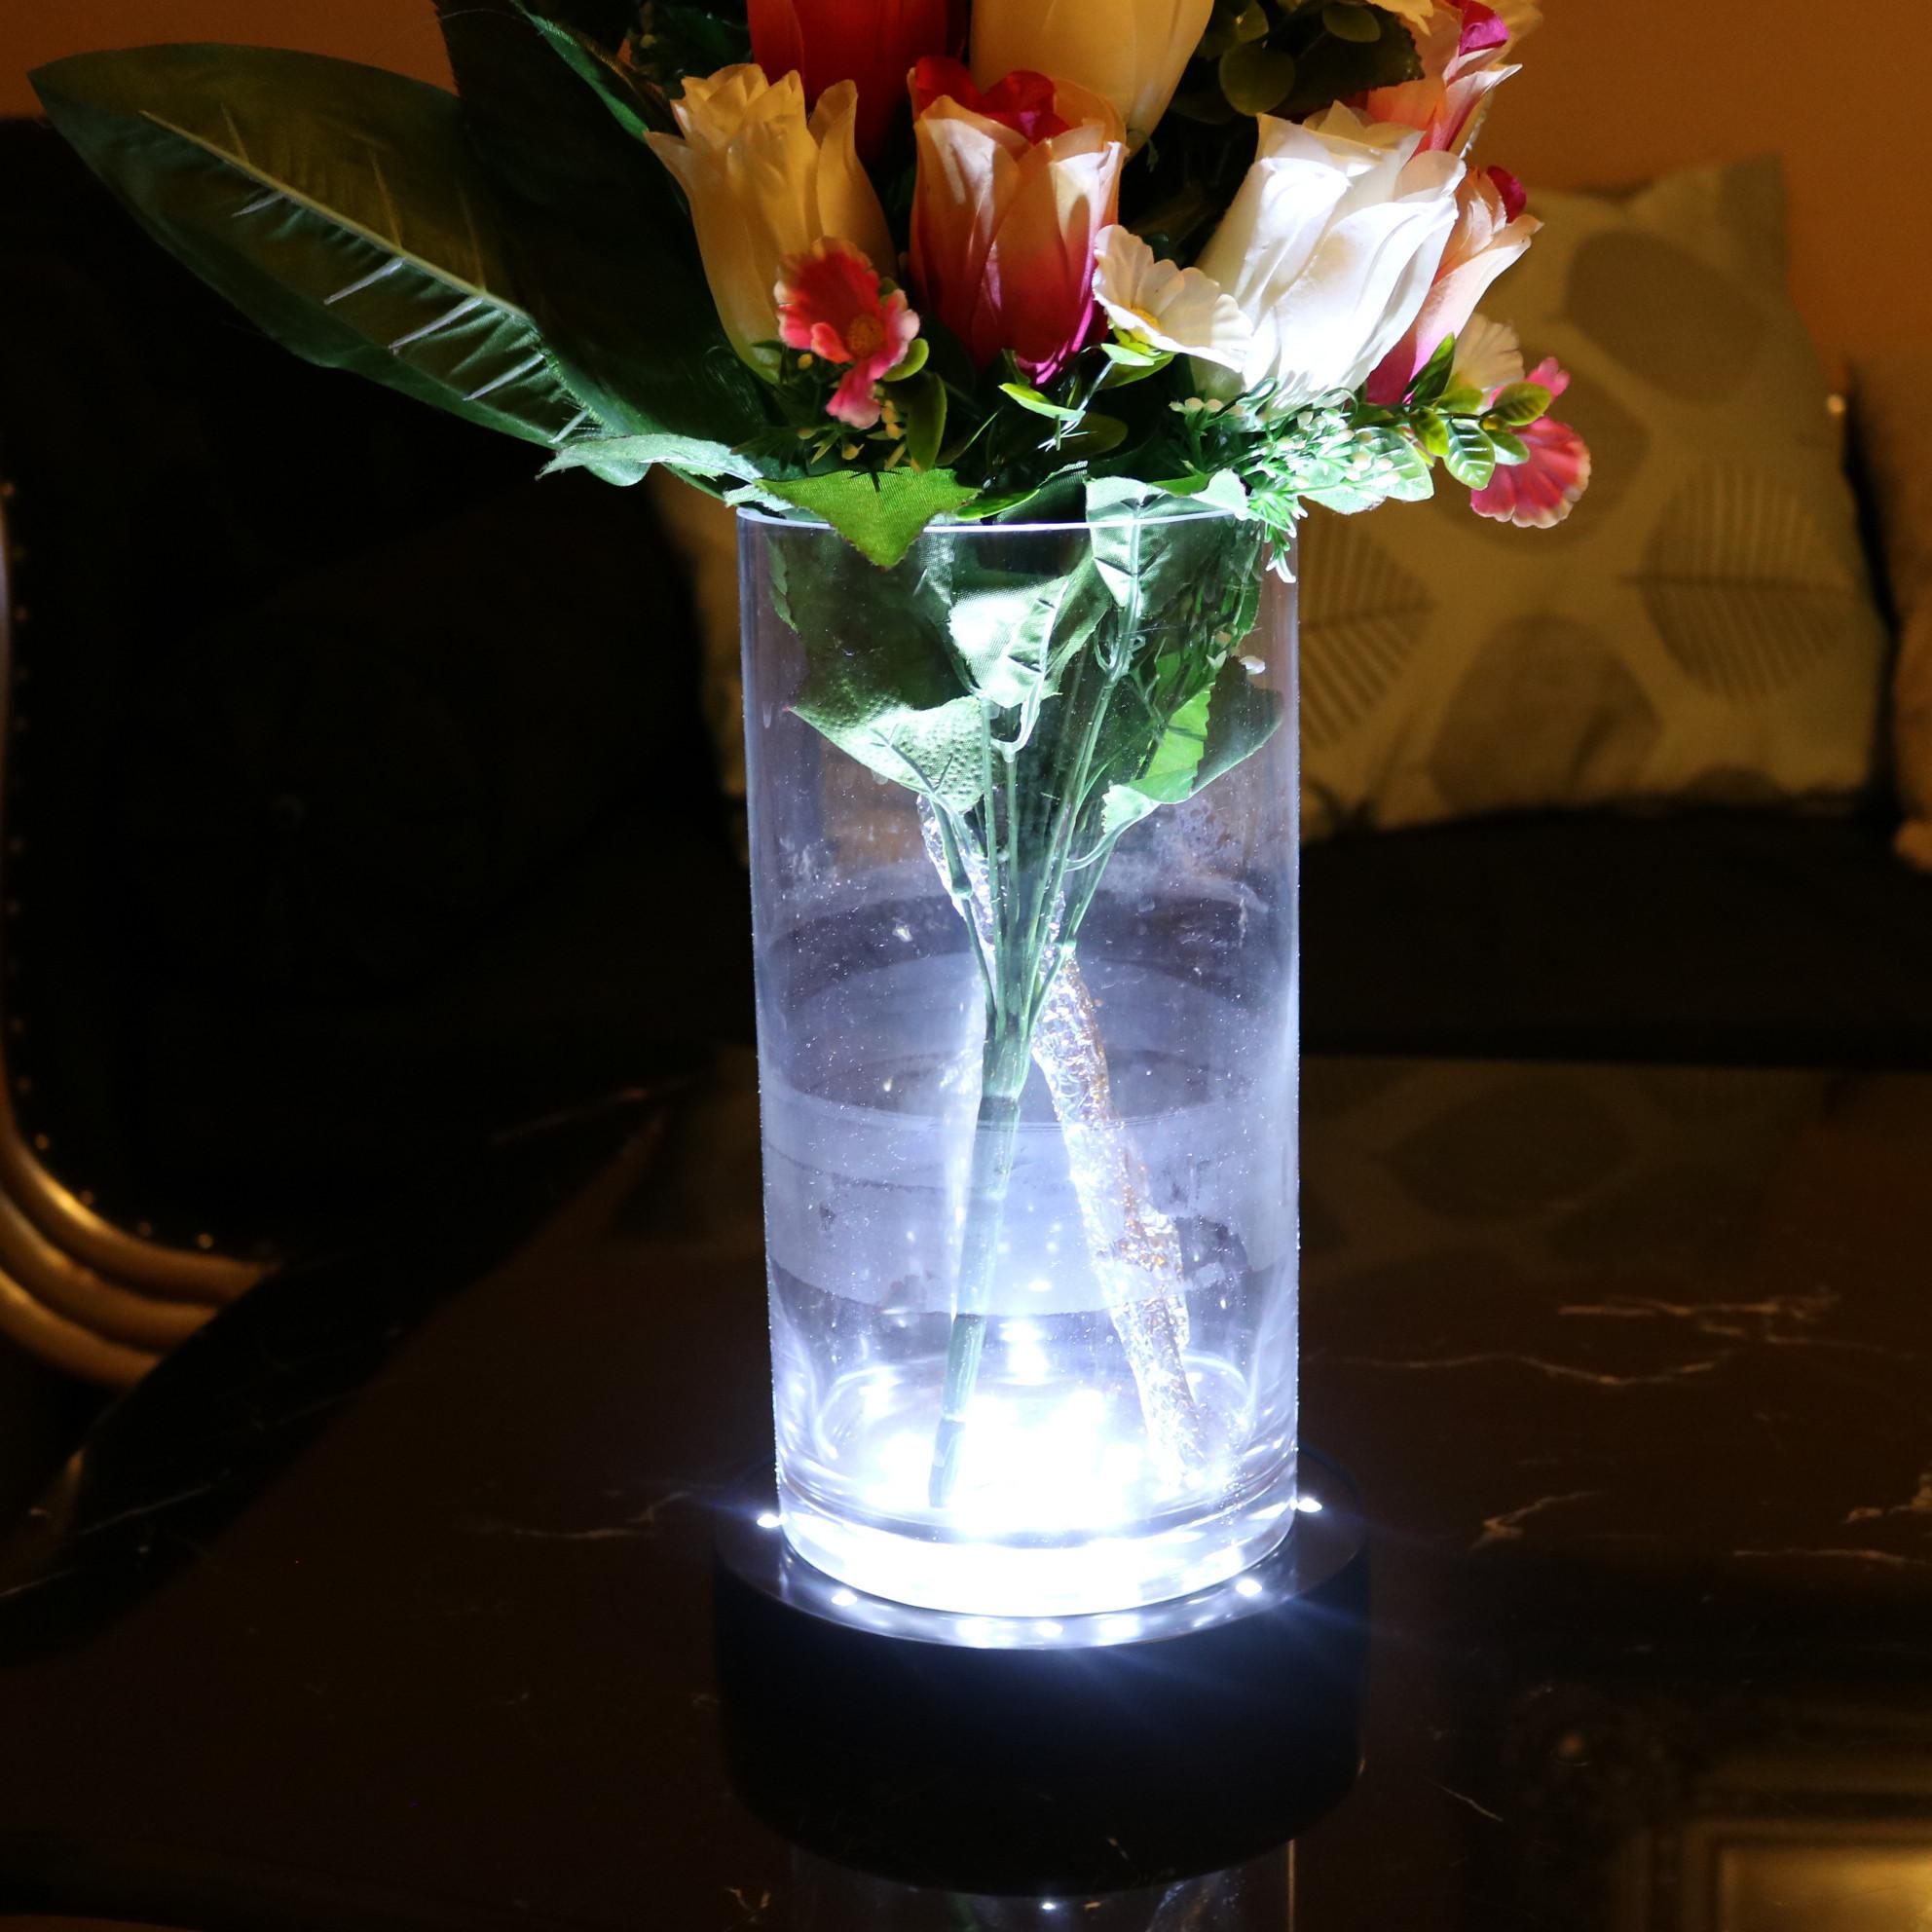 Led Flowers In Vase Of Light Base Photos 2017 10 12 09 27 47h Vases